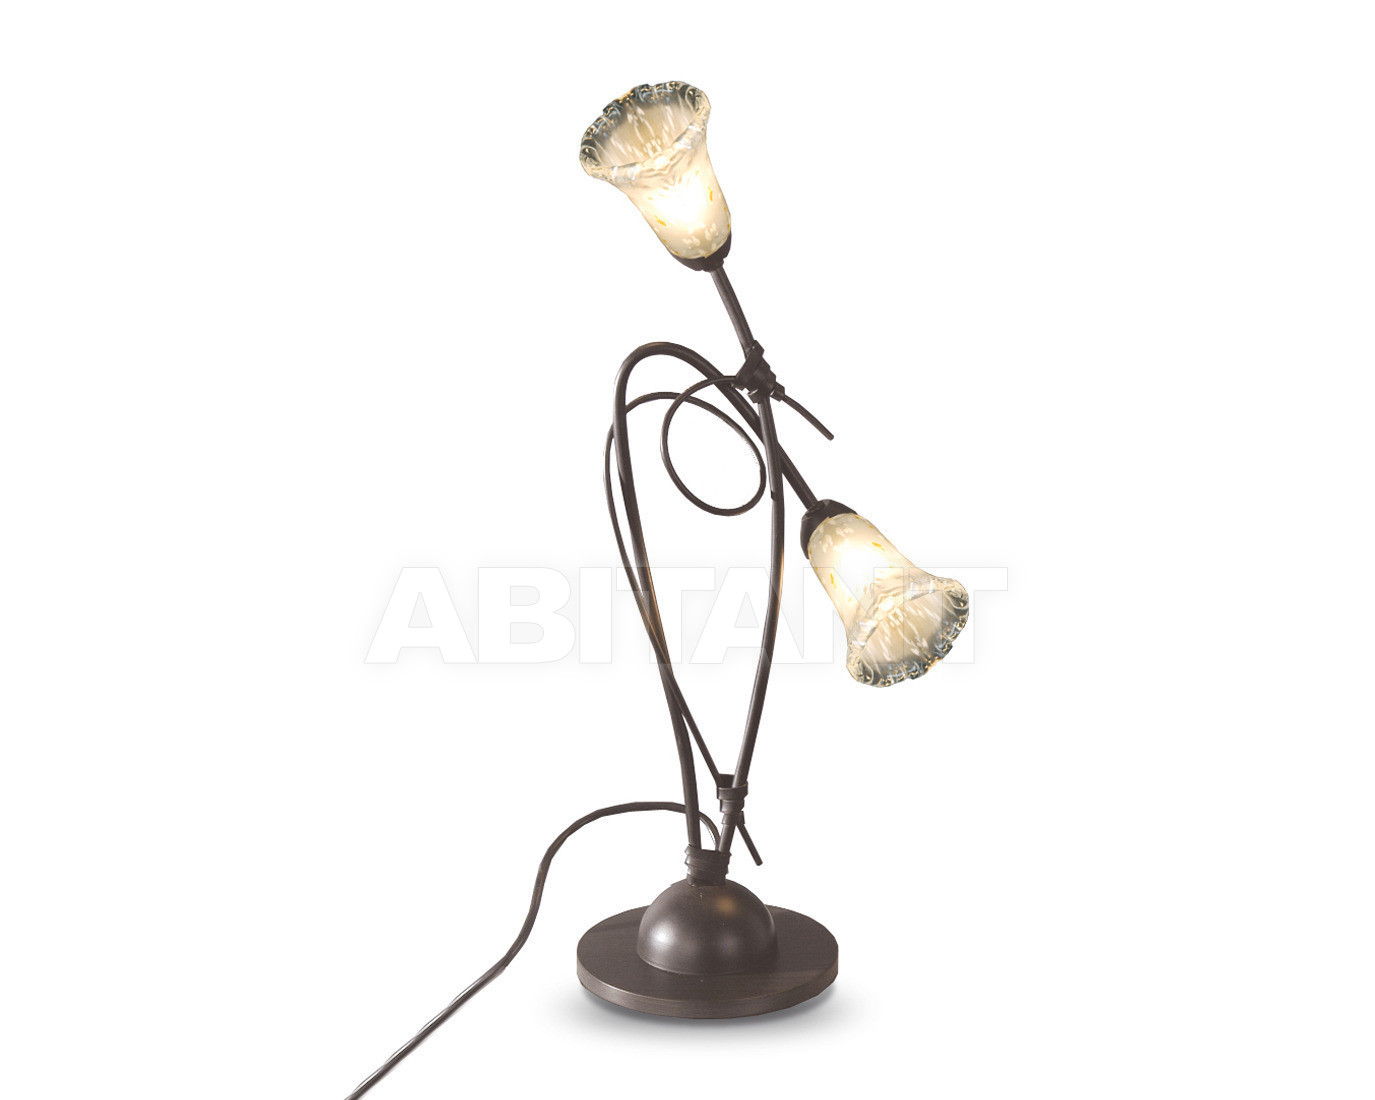 Купить Лампа настольная Linea Verdace 2012 LV 72152/R